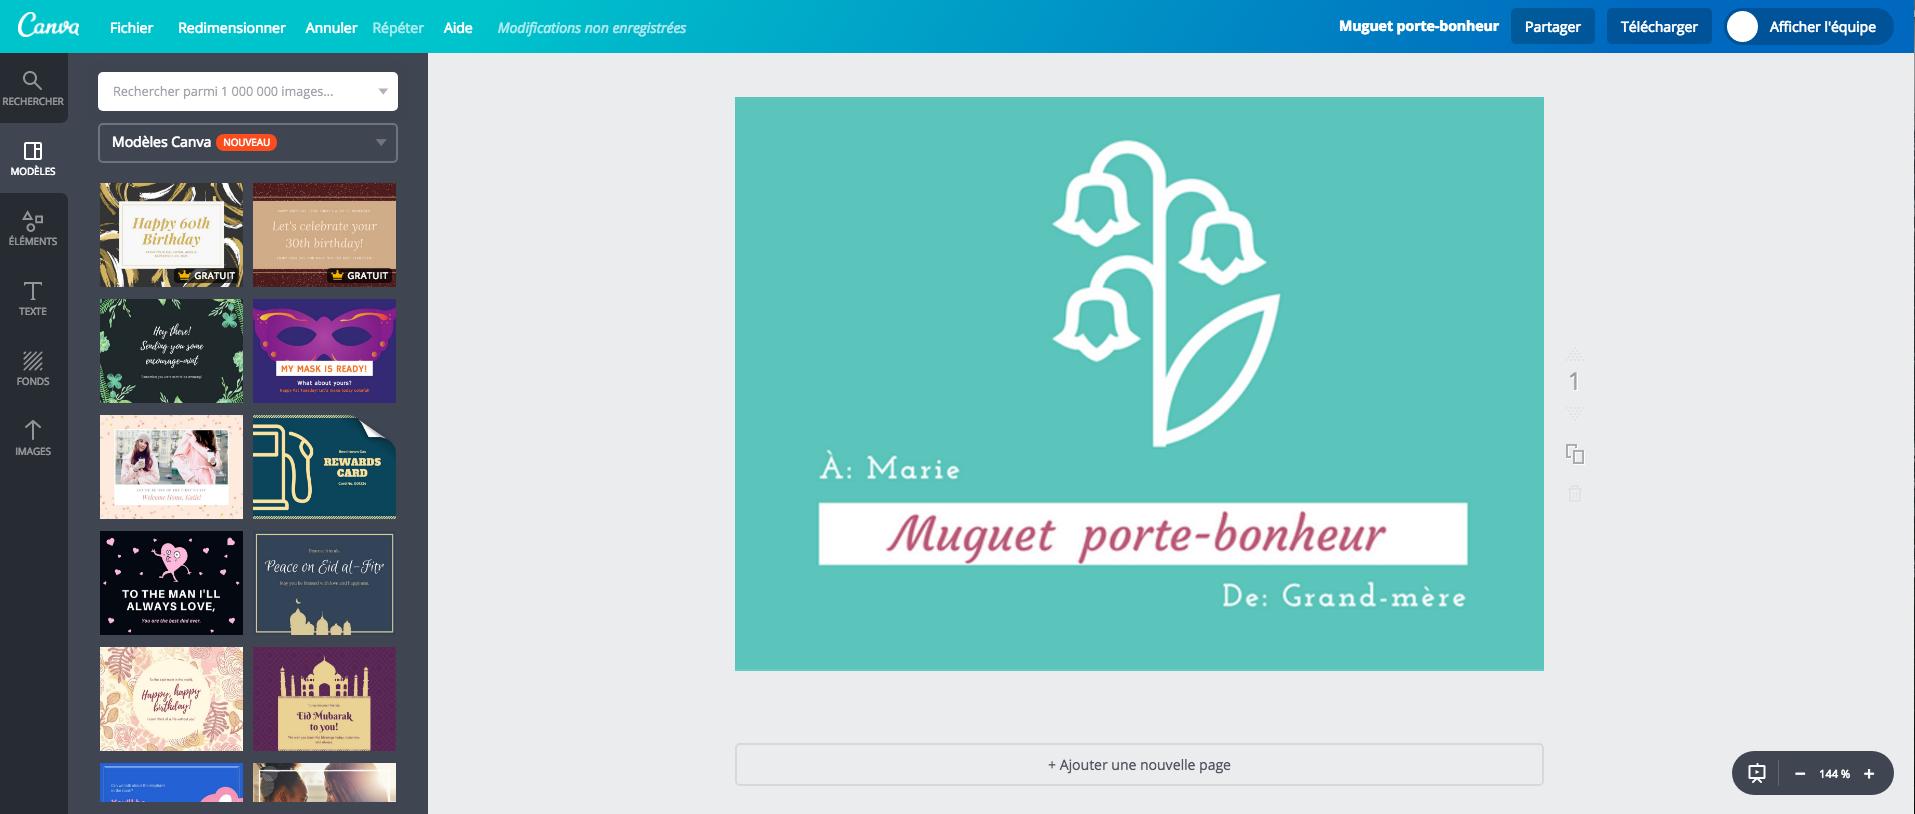 cr u00e9ez une carte du 1er mai avec du muguet virtuel